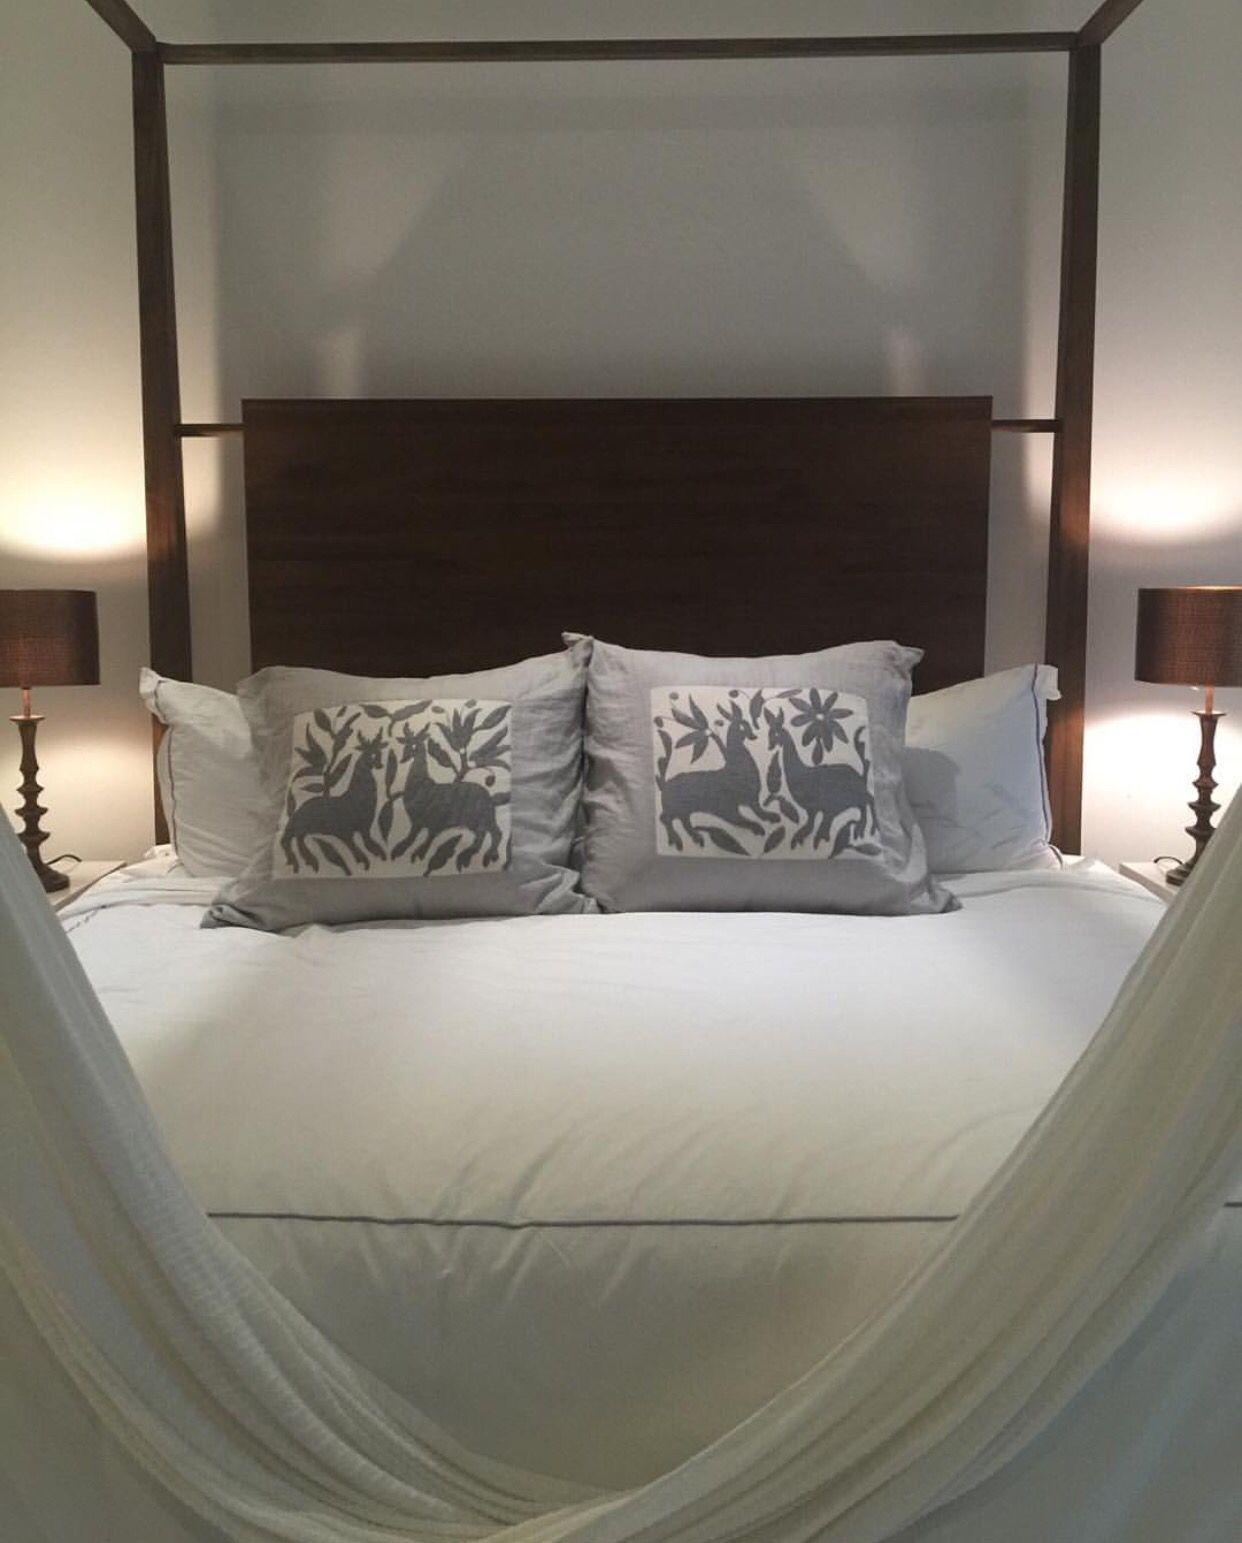 Cojines decorativos de lino con bordado Tenango! #cojines #bordadosmano #decoracion #hechoamano #artelocal #artesanal #comerciojusto #ideasdedecoracion #bordadotenango #ayudanosaayudar #deco  100% linen decorative pillows with Tenango embroidery! #cushions #handembroidery #deco #tenangoembroidery #l4l #loveit #instagood #followme #decorationideas #linen  #handmade #fairtrade #bedroom #helptohelp #bedroomdecor #specialtouch #decoration #interiordecor #art #interiordesign